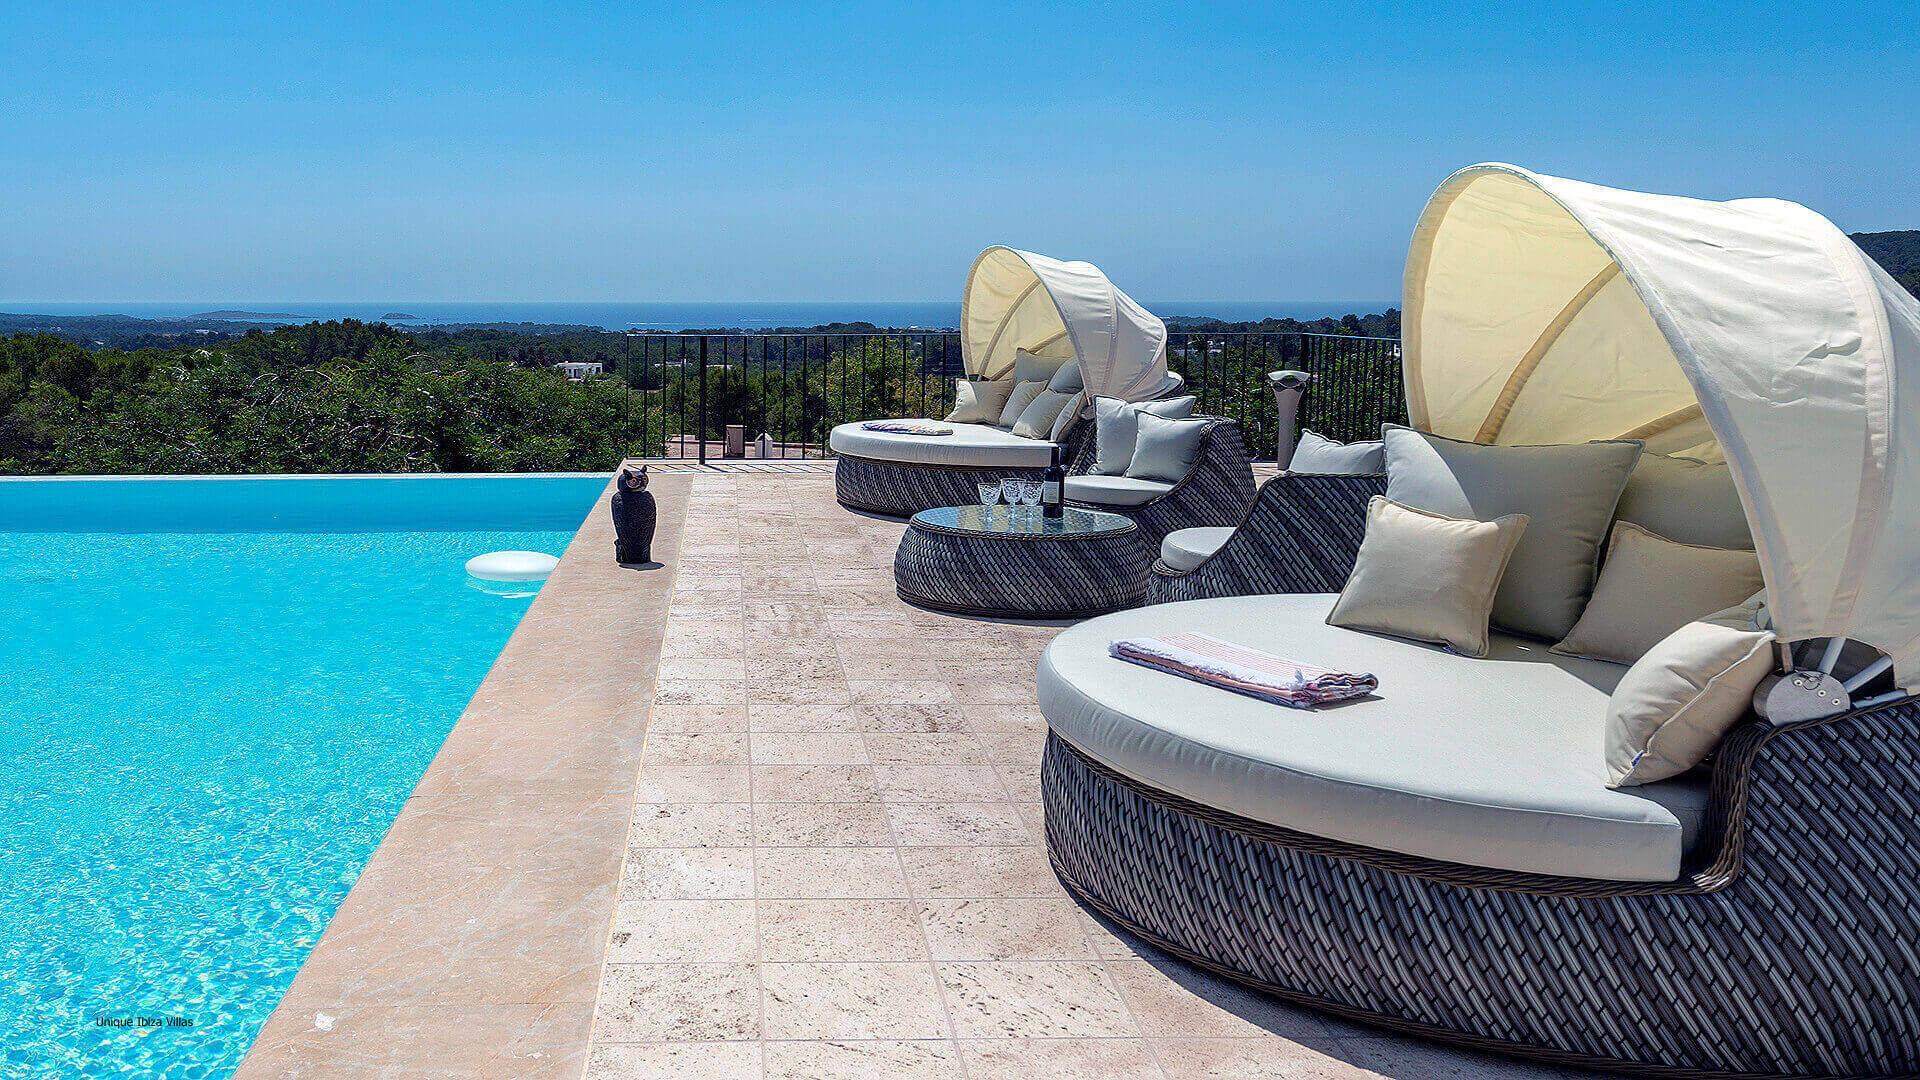 Casa Prats Ibiza 4 Santa Eulalia